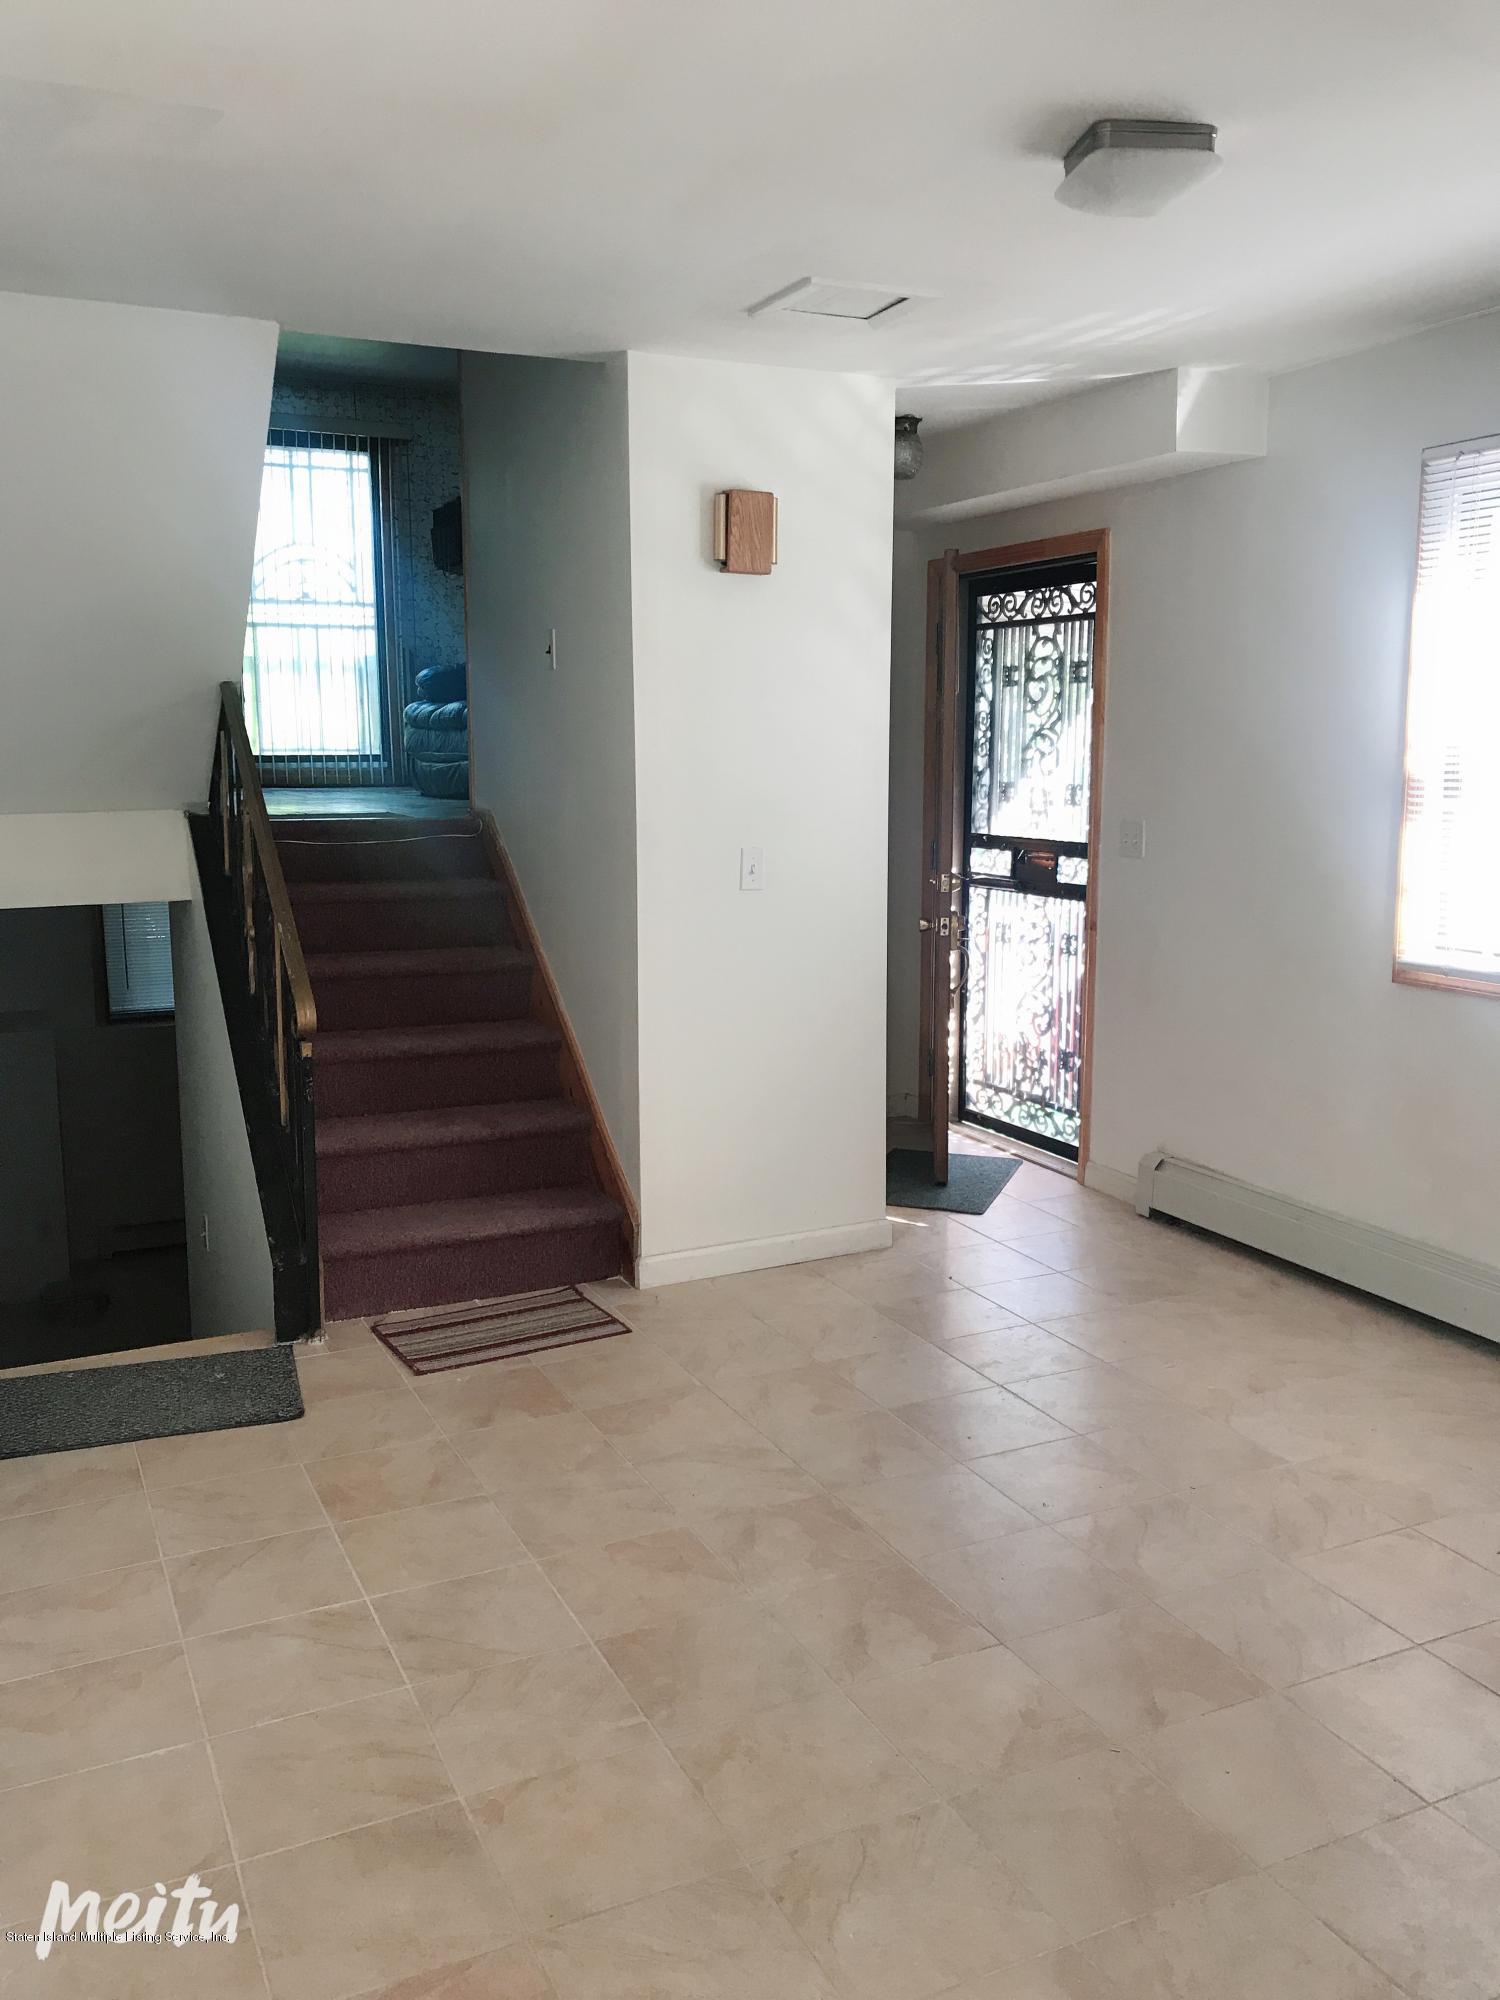 Single Family - Semi-Attached 129 Moreland Street  Staten Island, NY 10306, MLS-1129862-4